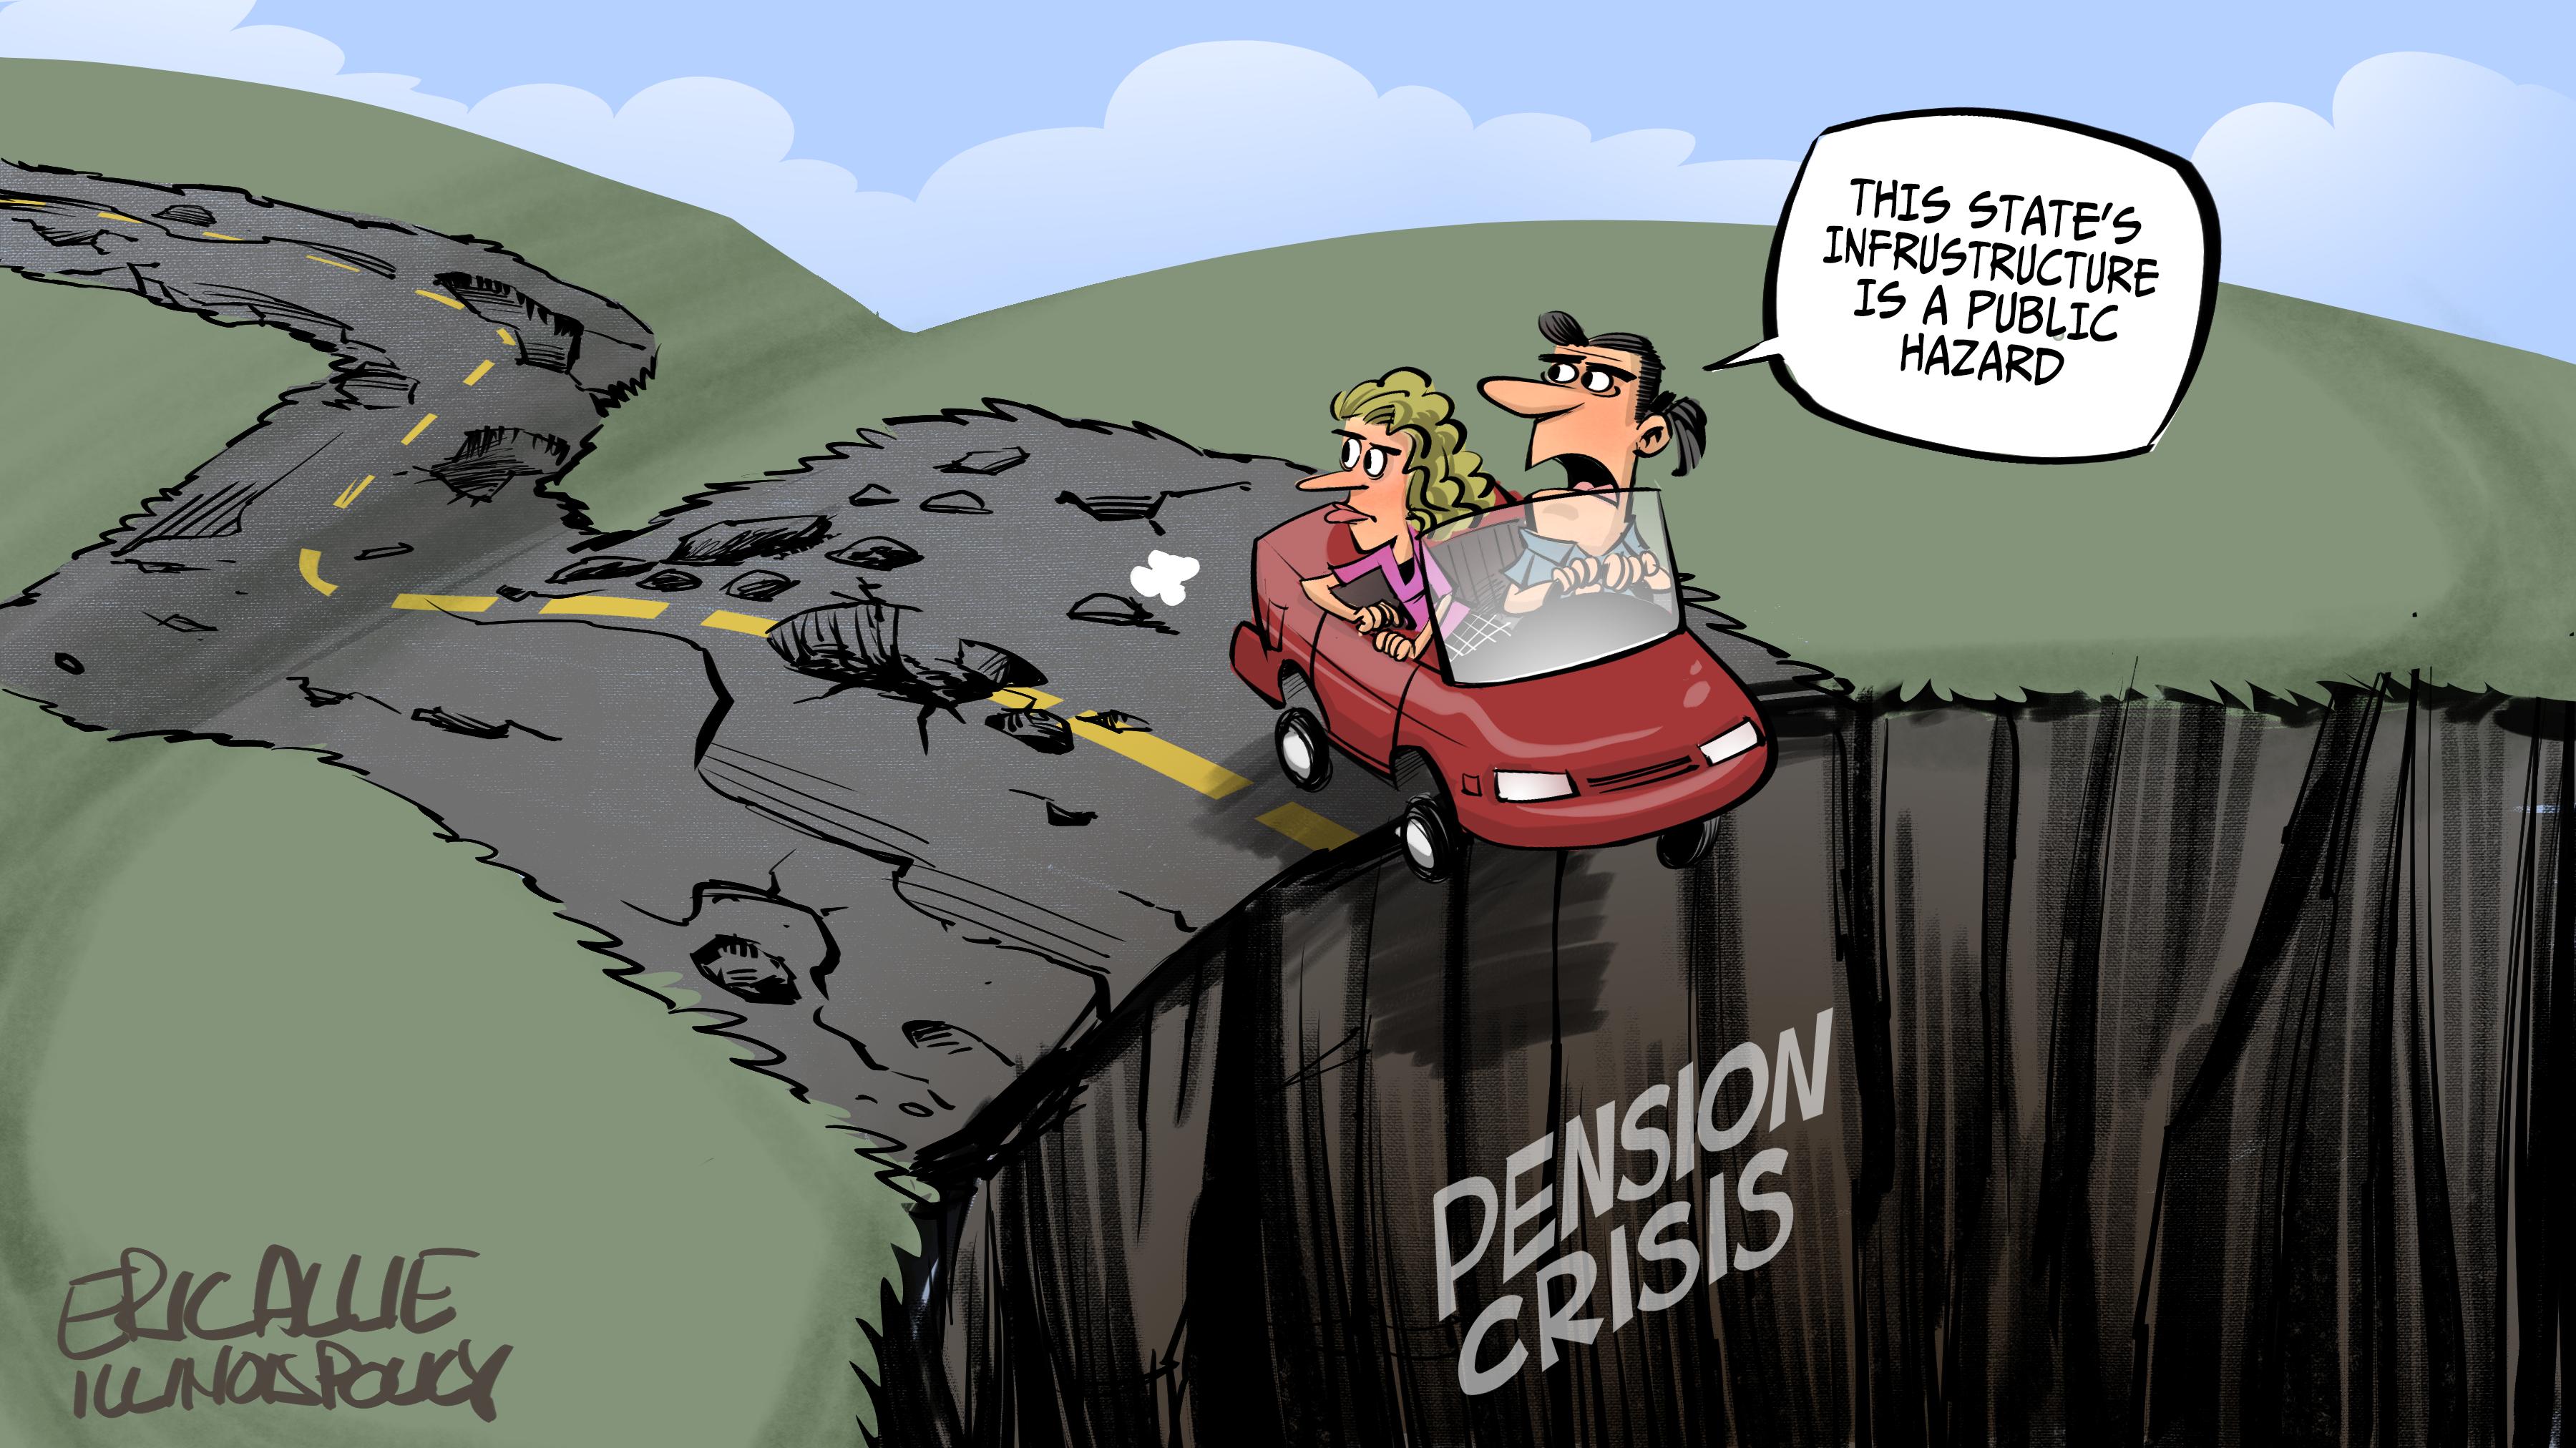 Illinois' infrastructure problems